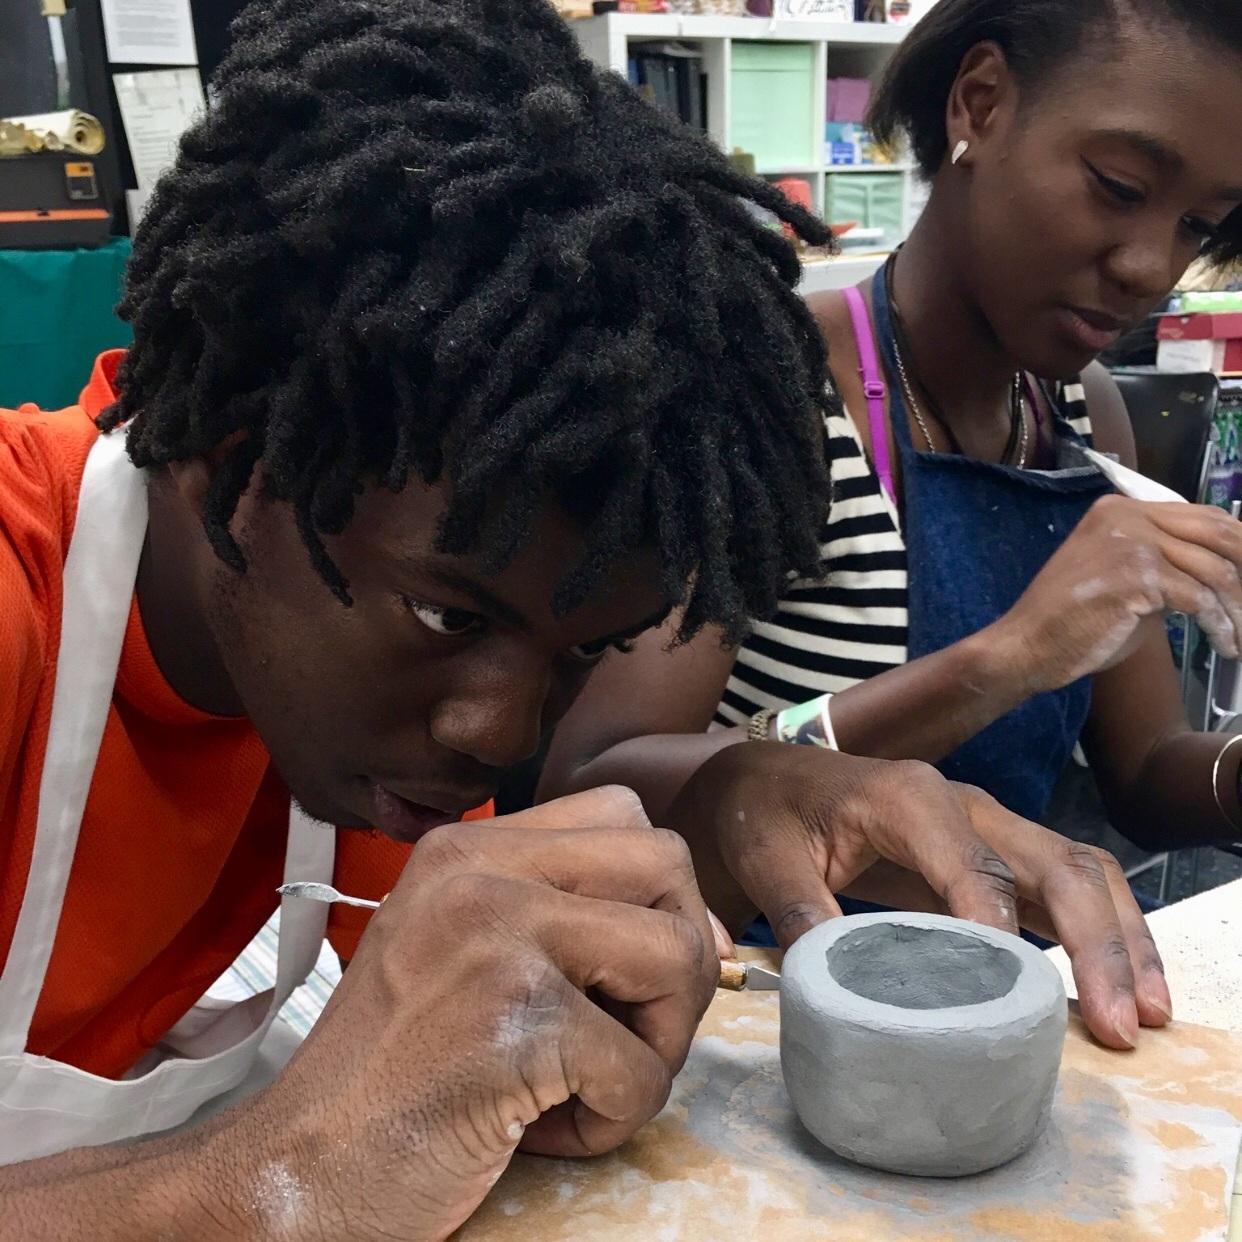 kid+making+pottery.jpg